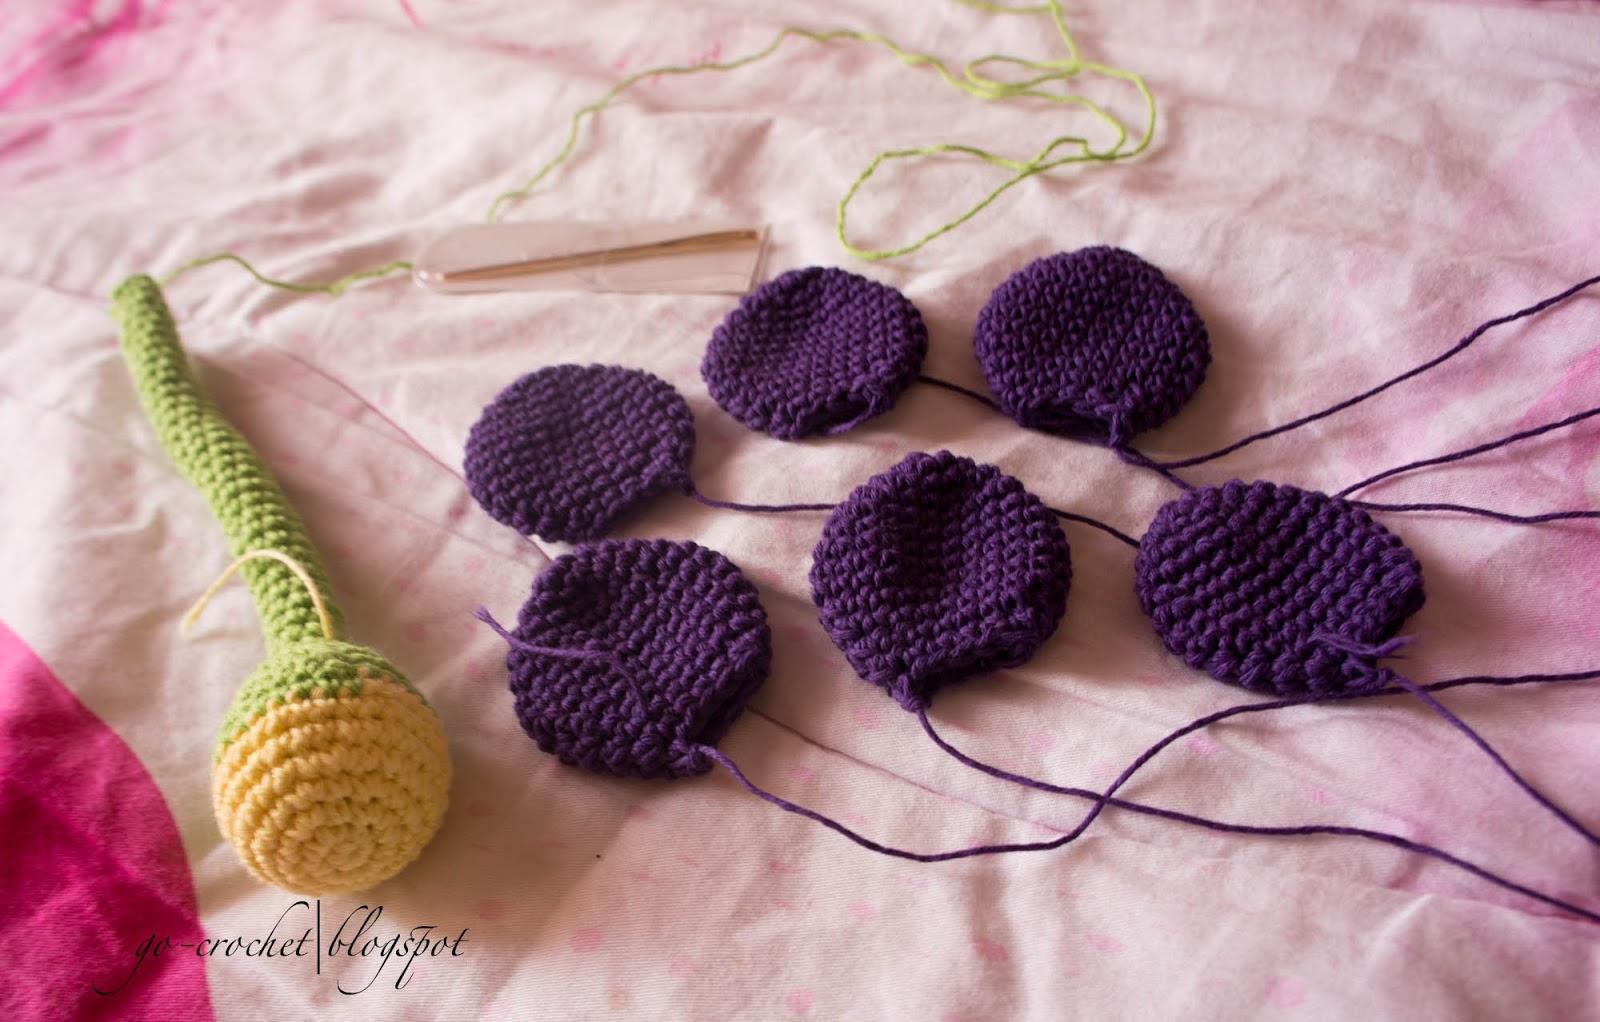 Crochet Amigurumi Flowers : Go Crochet!: Flower Amigurumi